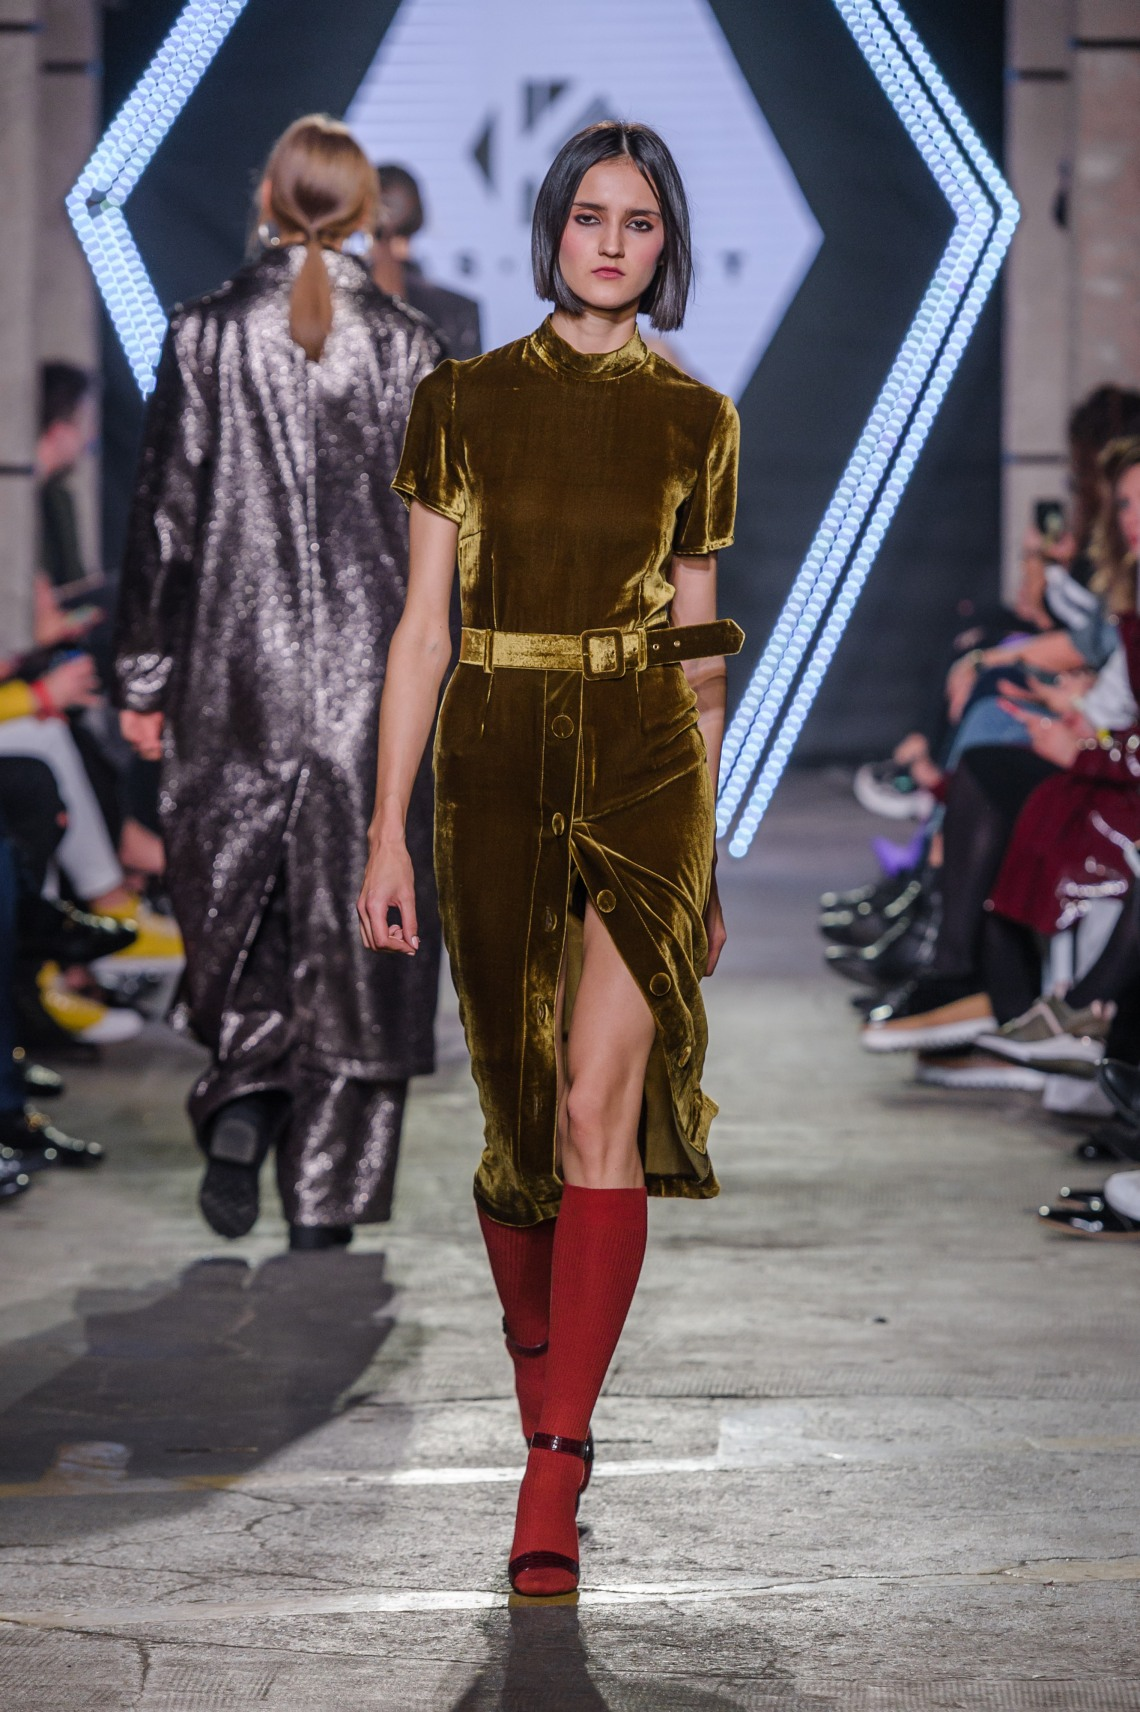 12ktw-101118_15-kaskryst_highres_fotfilipokopny-fashionimages